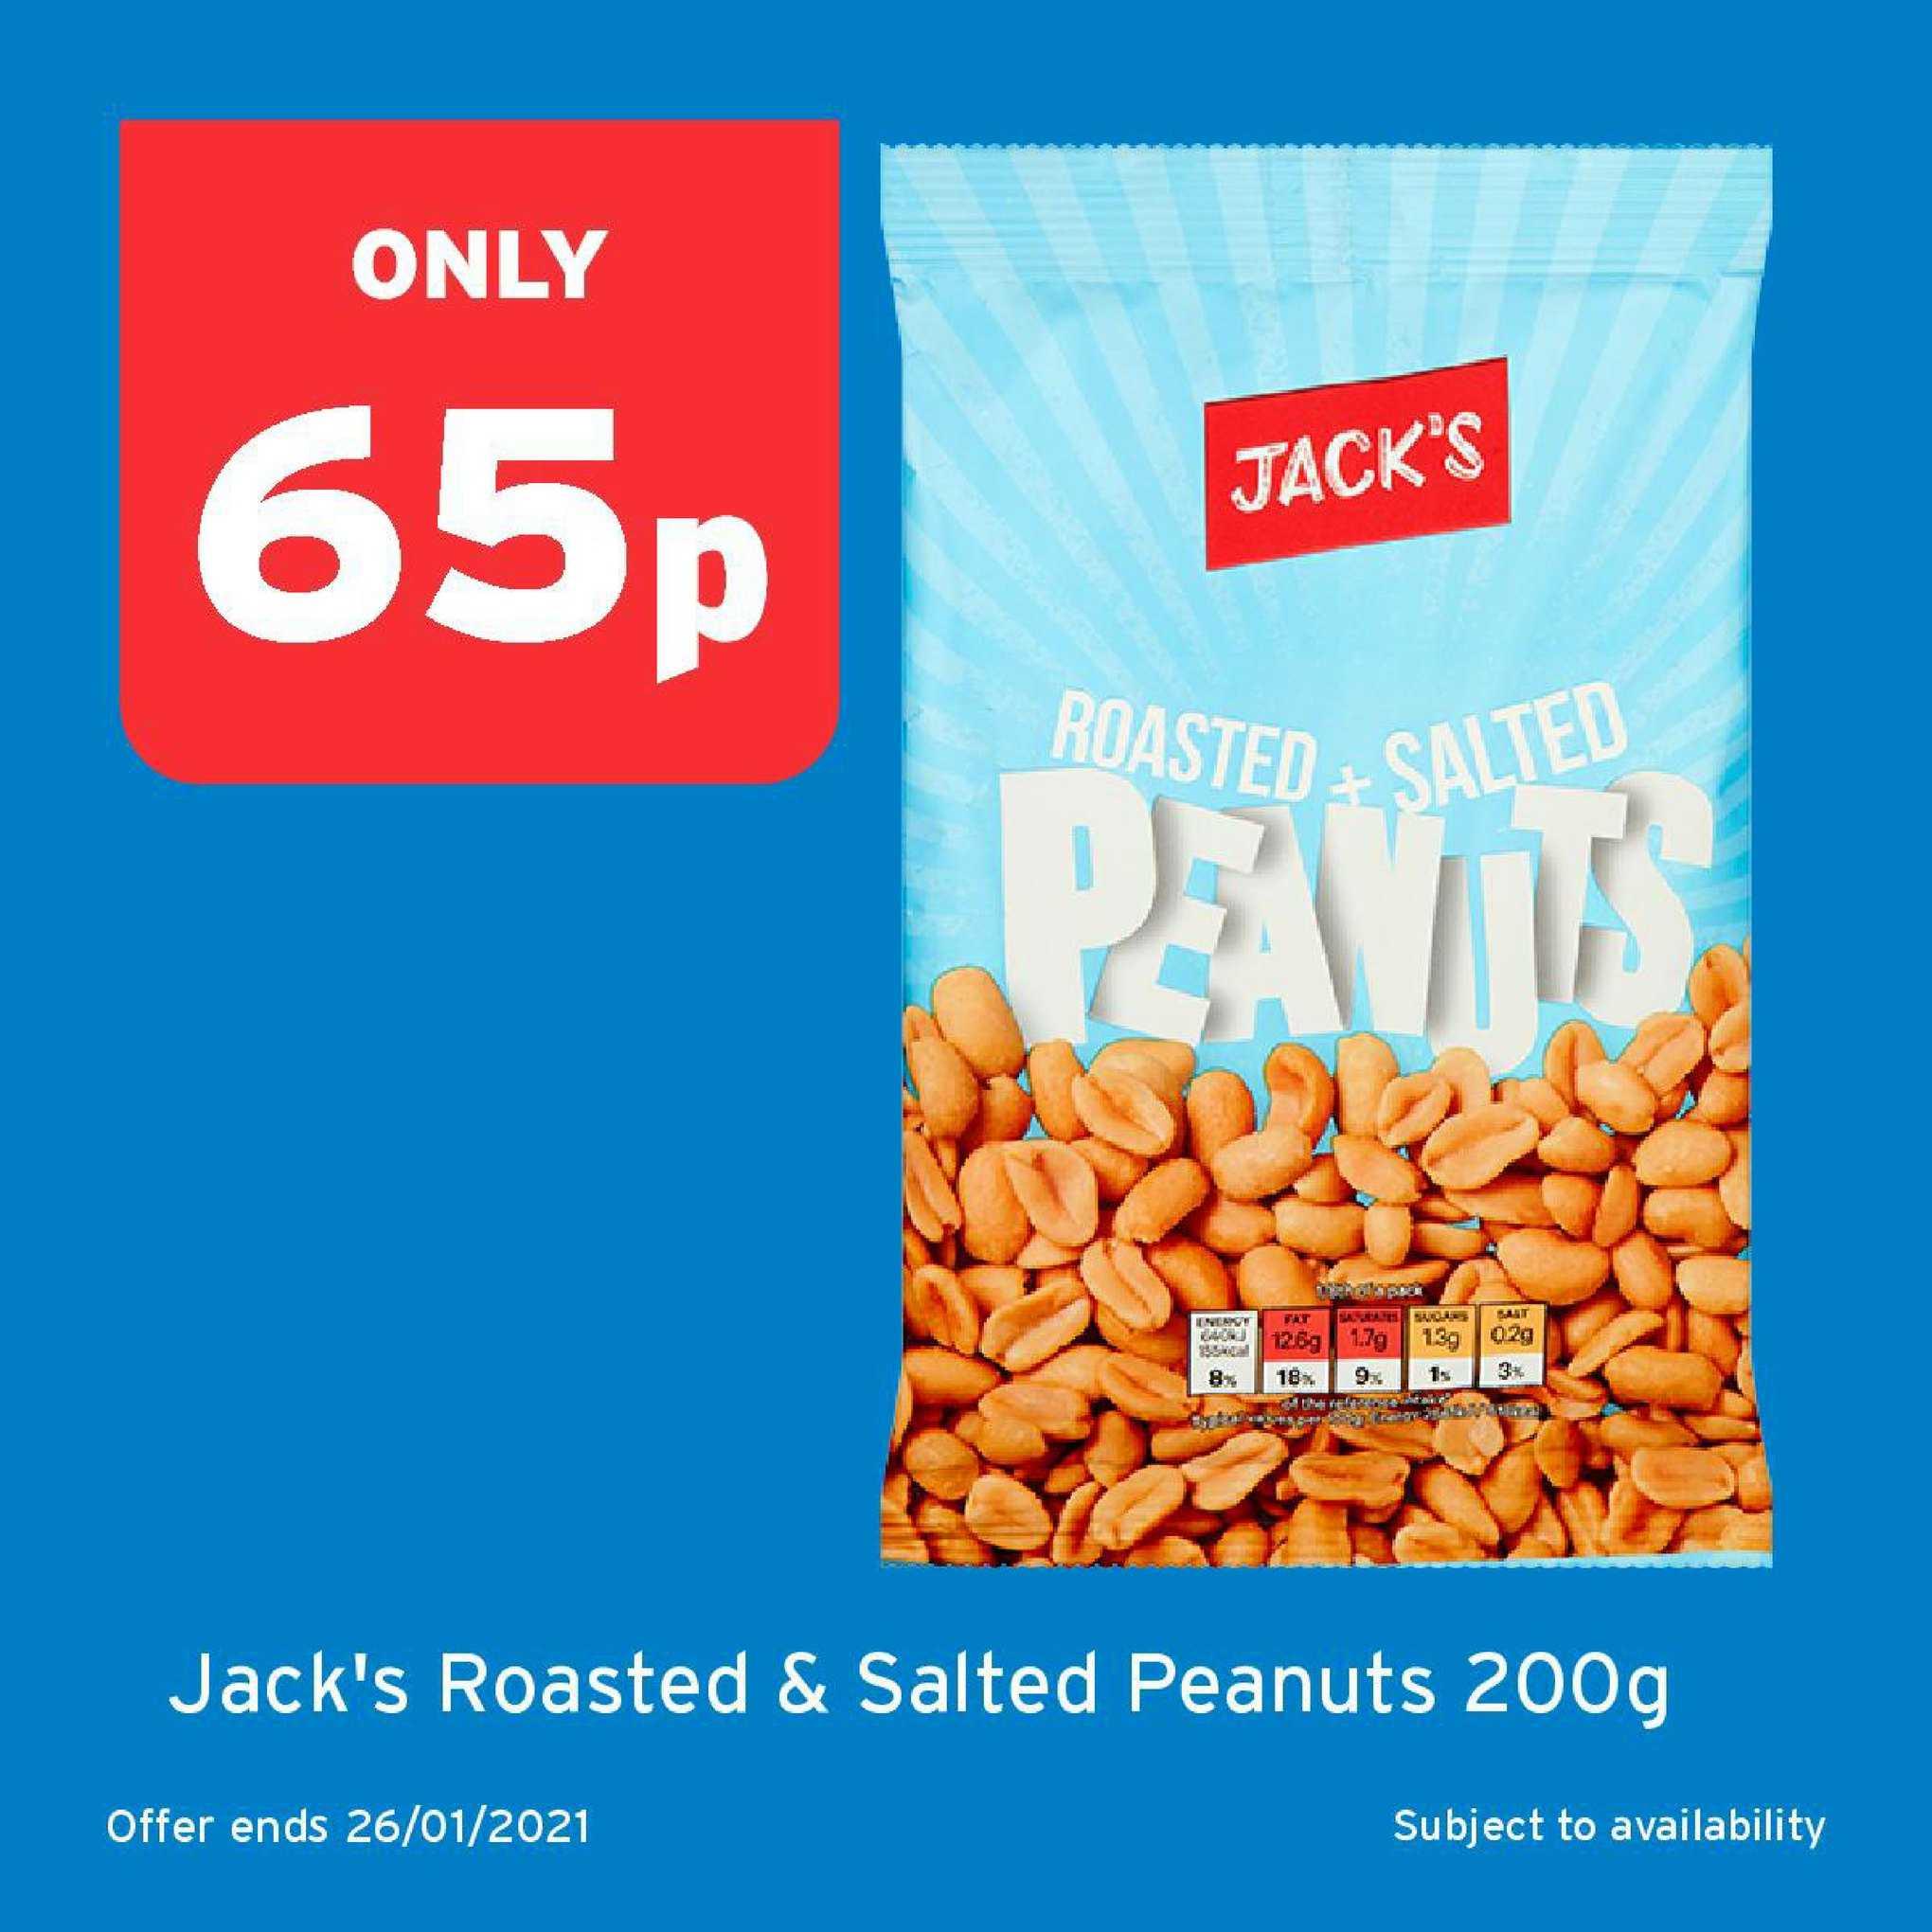 One Stop Jack's Roasted & Salted Peanuts